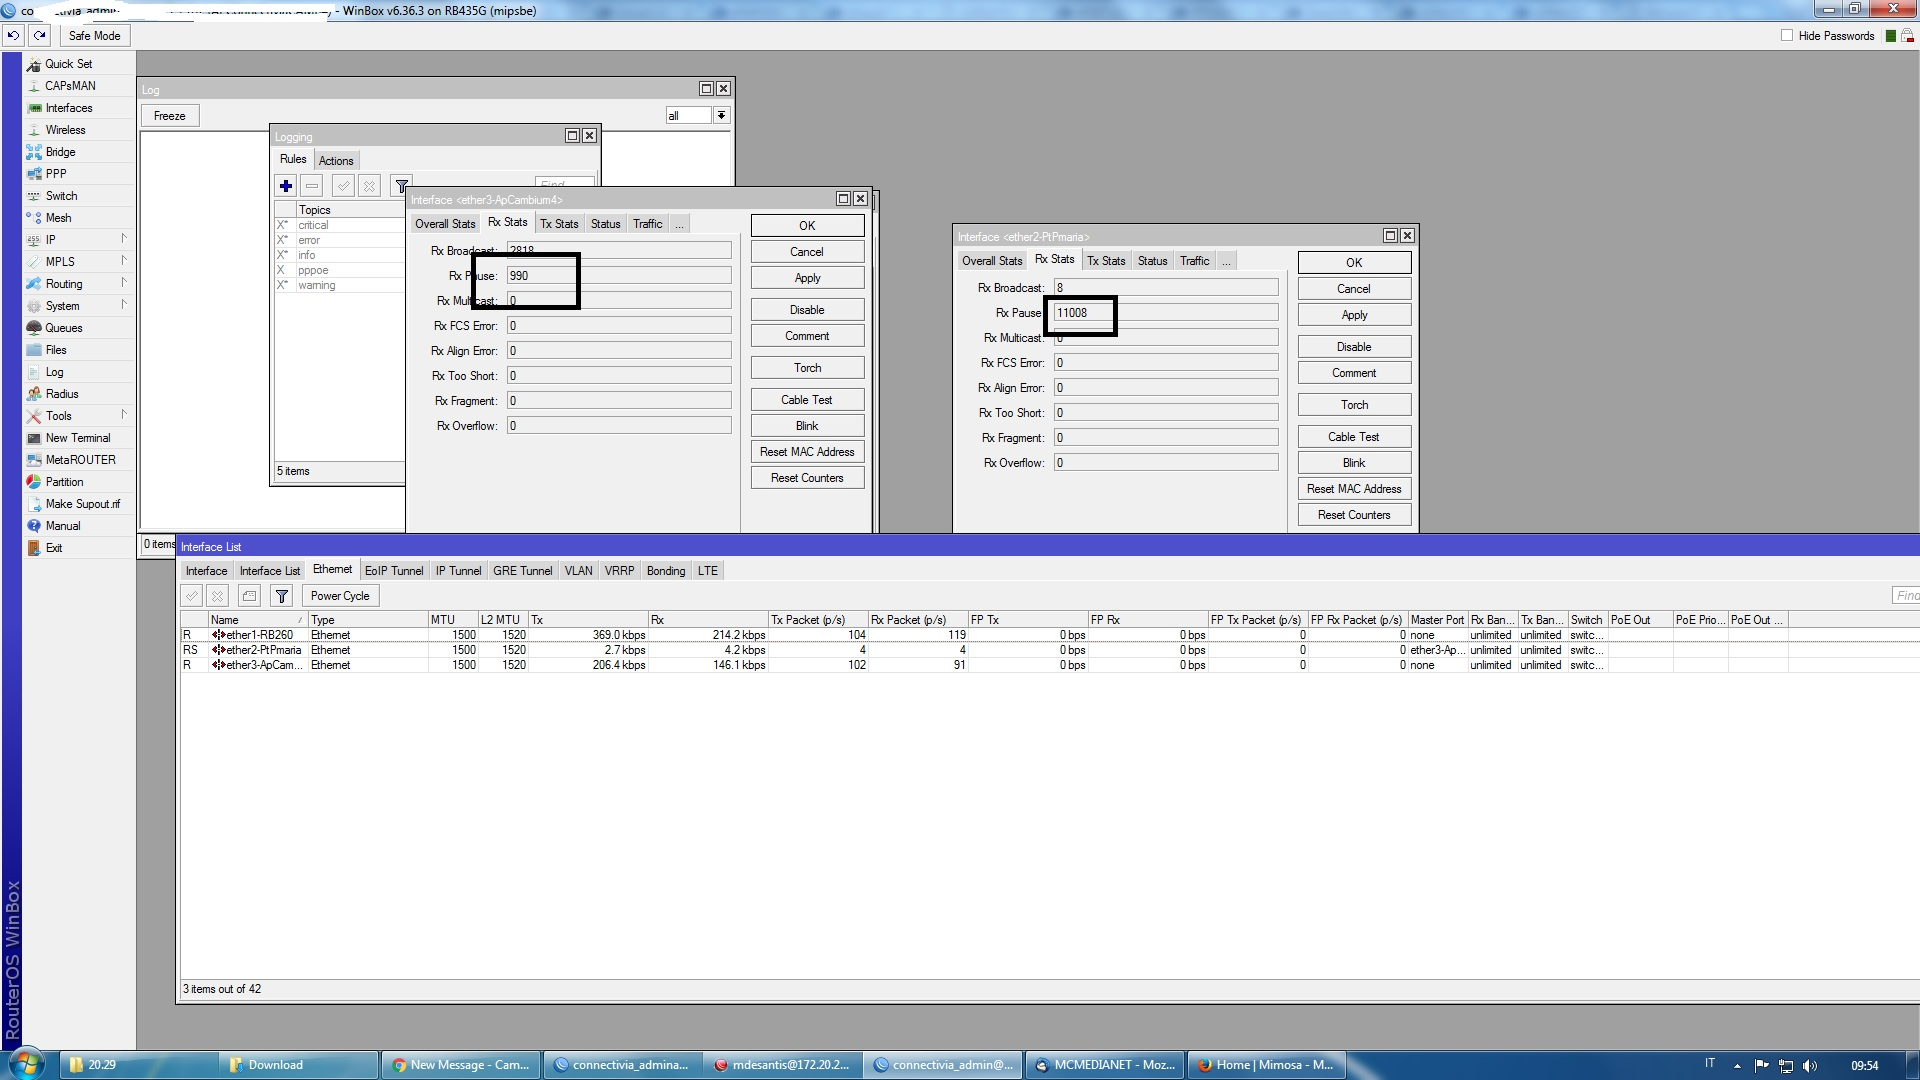 RX frame pause between mikrotik-epmp1000 - Cambium Networks